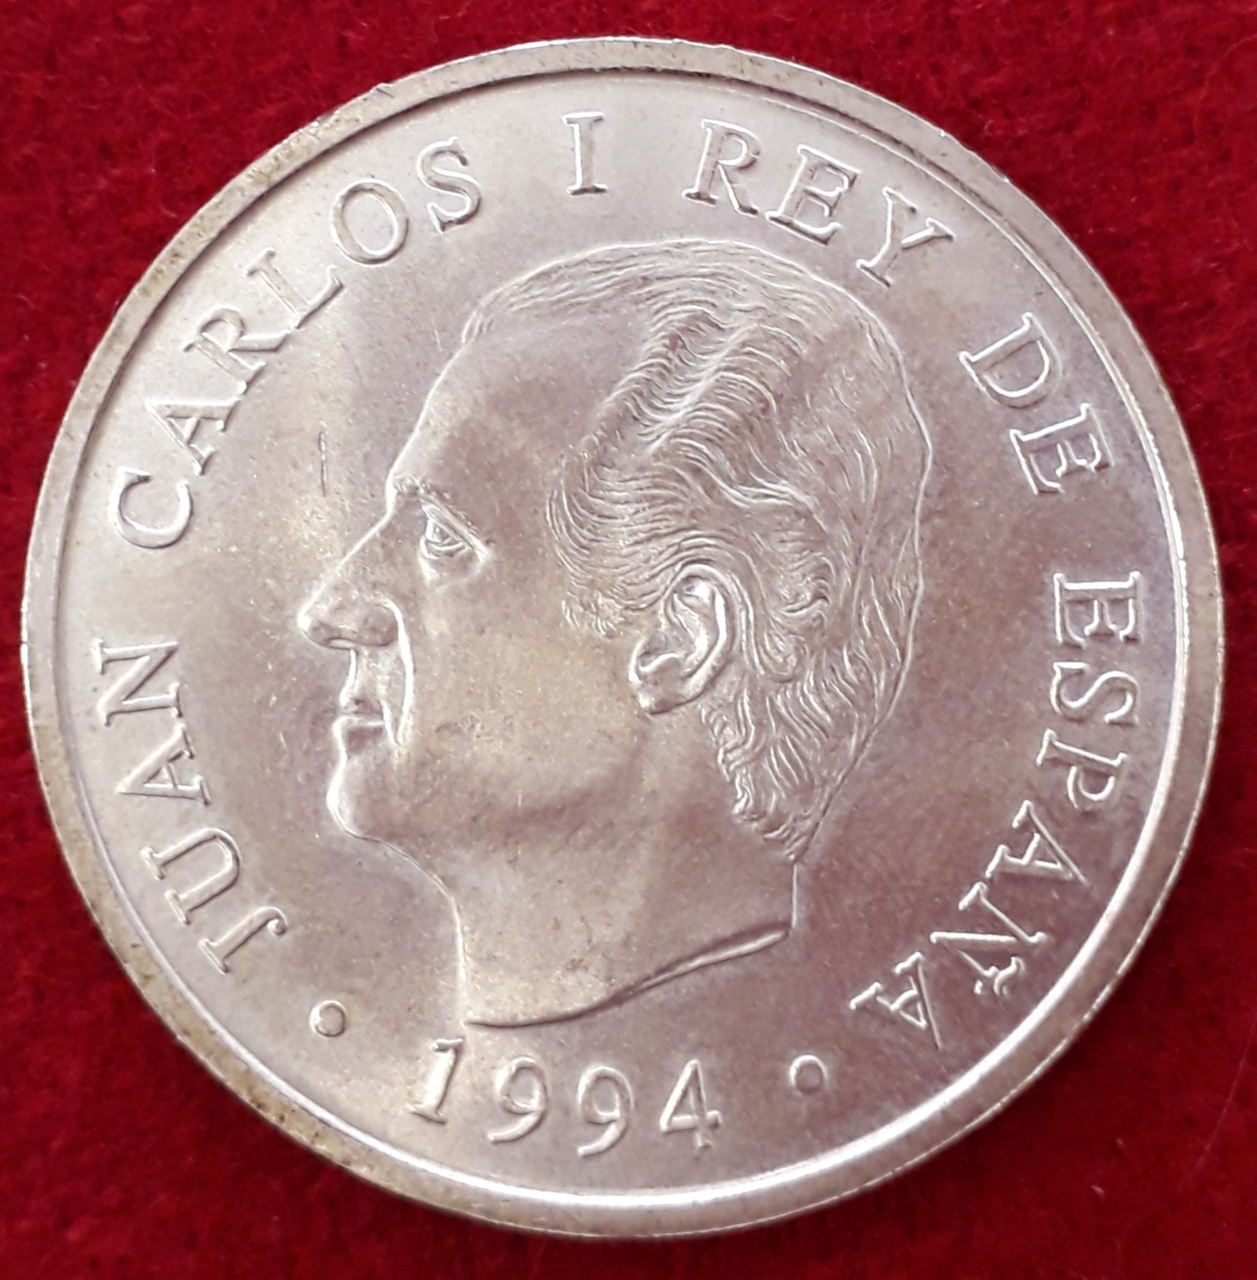 2000 Pesetas De Plata Juan Carlos I 1994 Ebc Numismática Felipe Vi